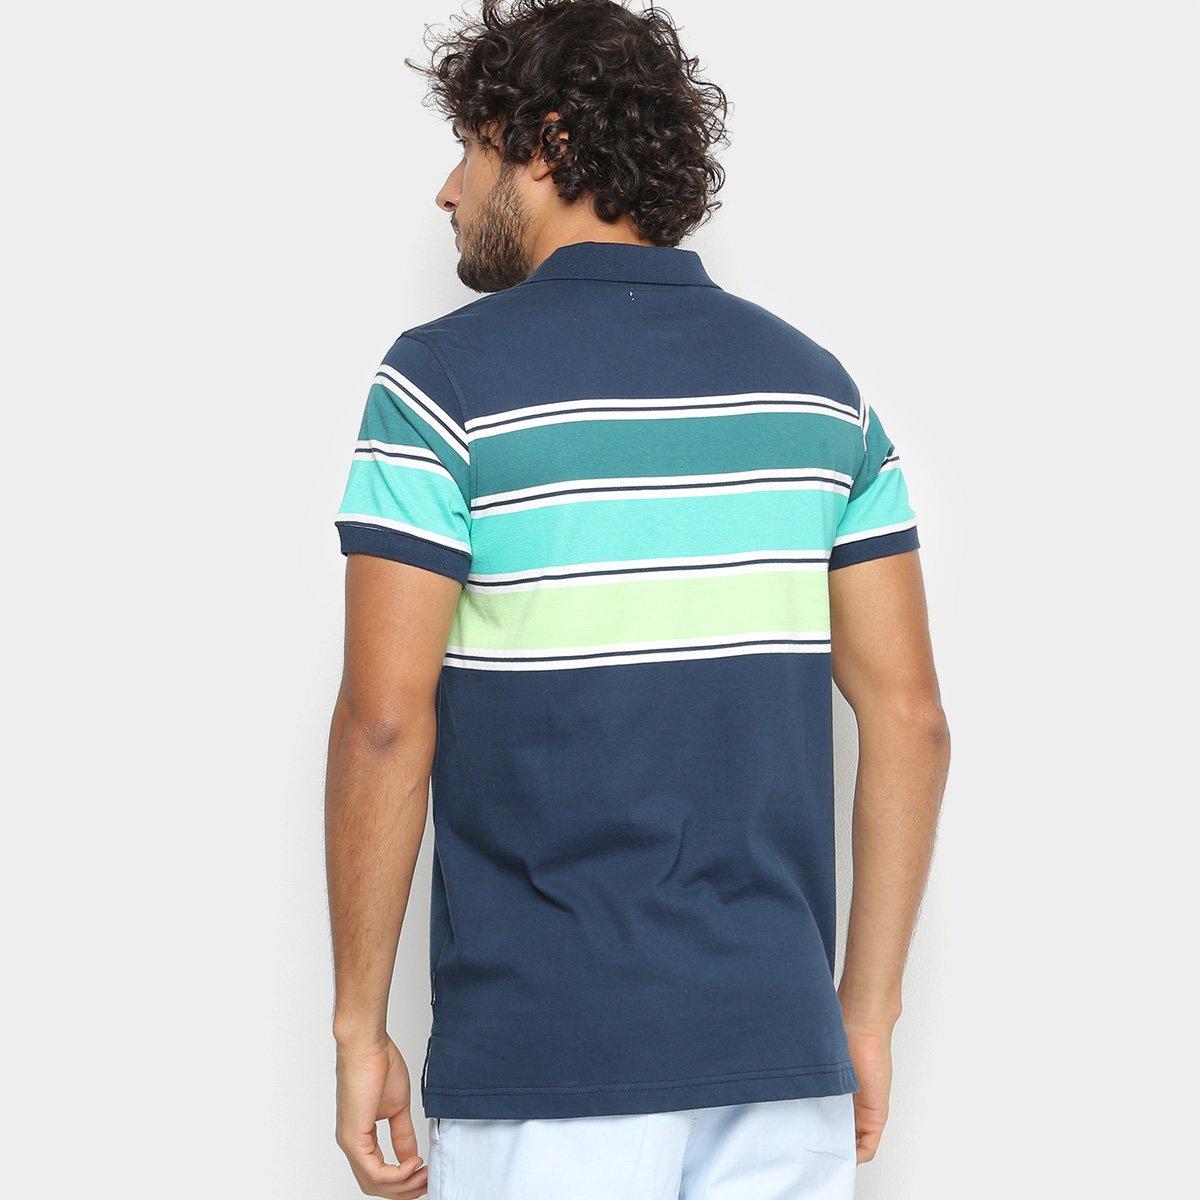 Camisa Polo Gajang Listras Masculina - Marinho